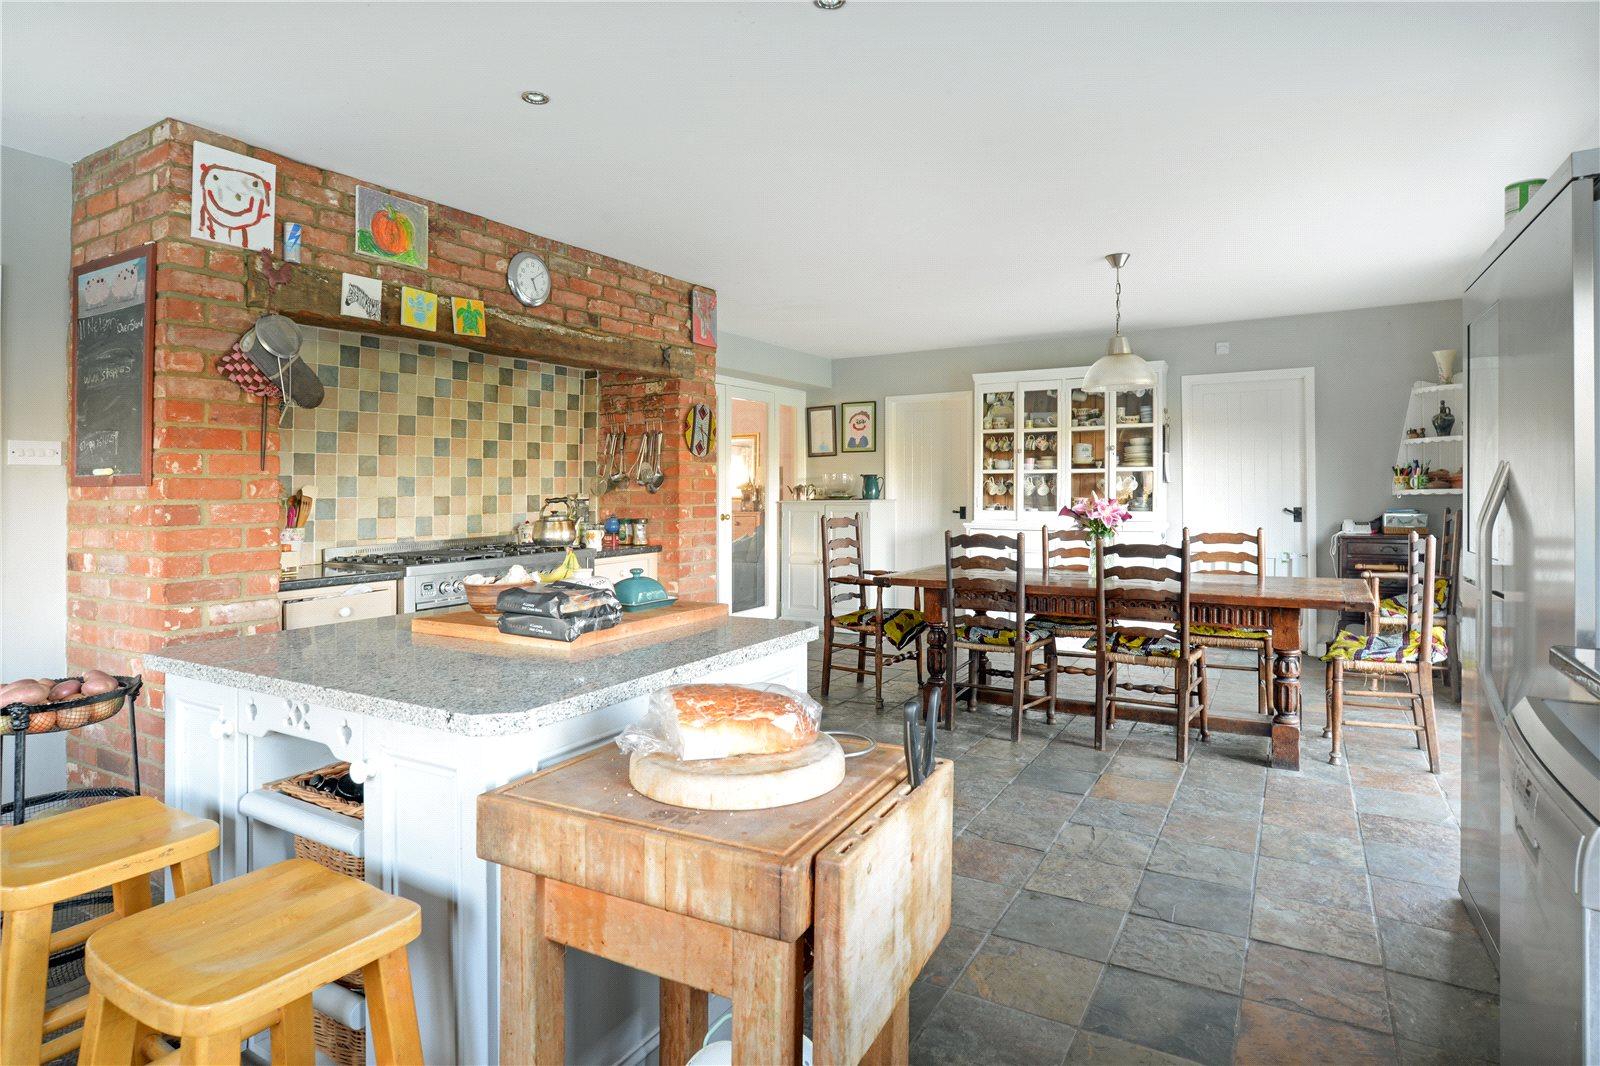 Eensgezinswoning voor Verkoop een t Fox Lane, Boughton-under-Blean, Faversham, Kent, ME13 Faversham, Engeland